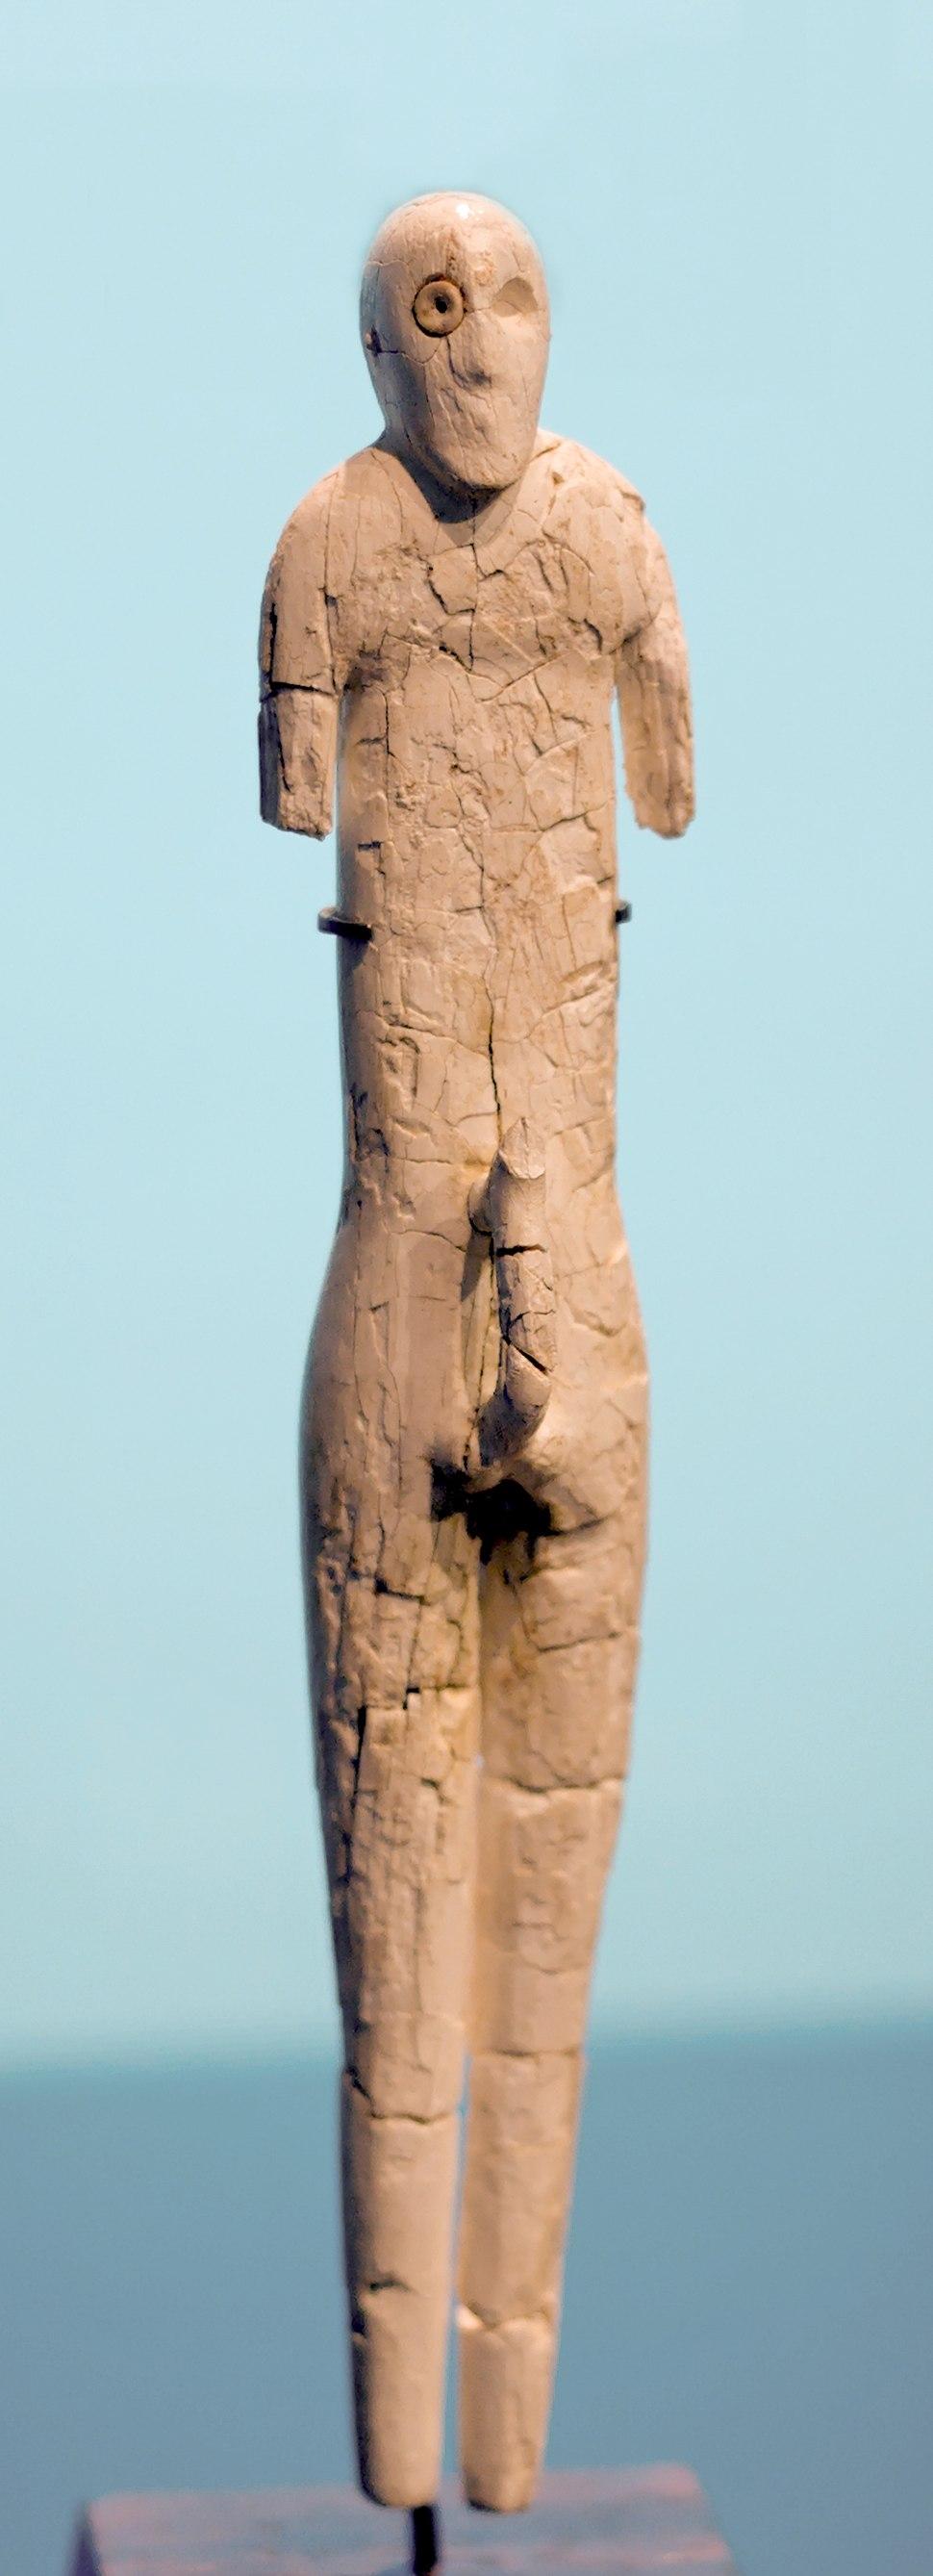 Naqada sculpture Louvre E27457